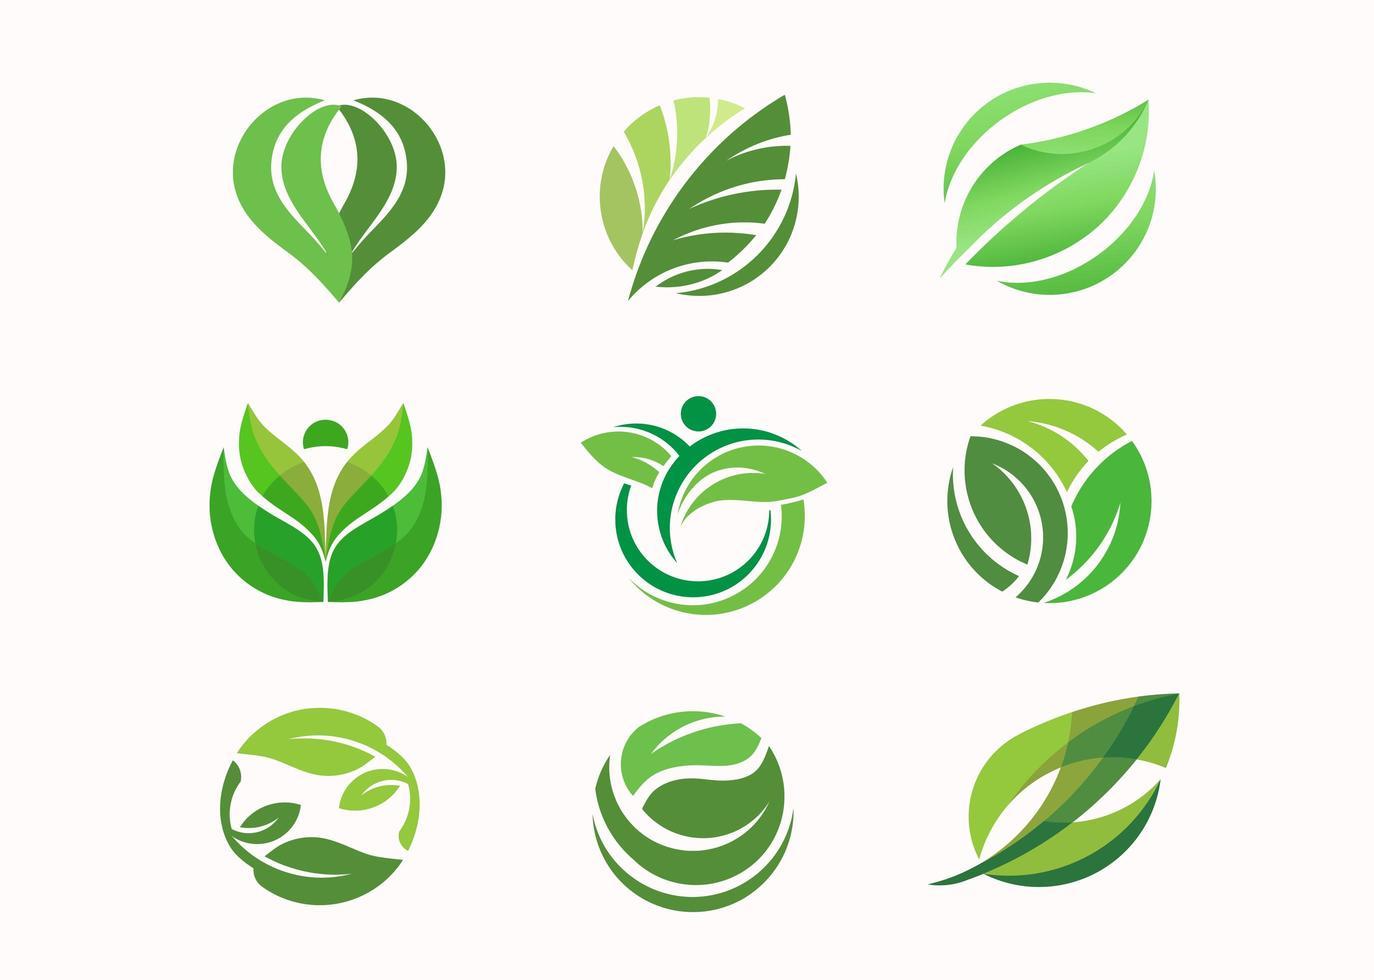 gröna blad cirkel samling vektor